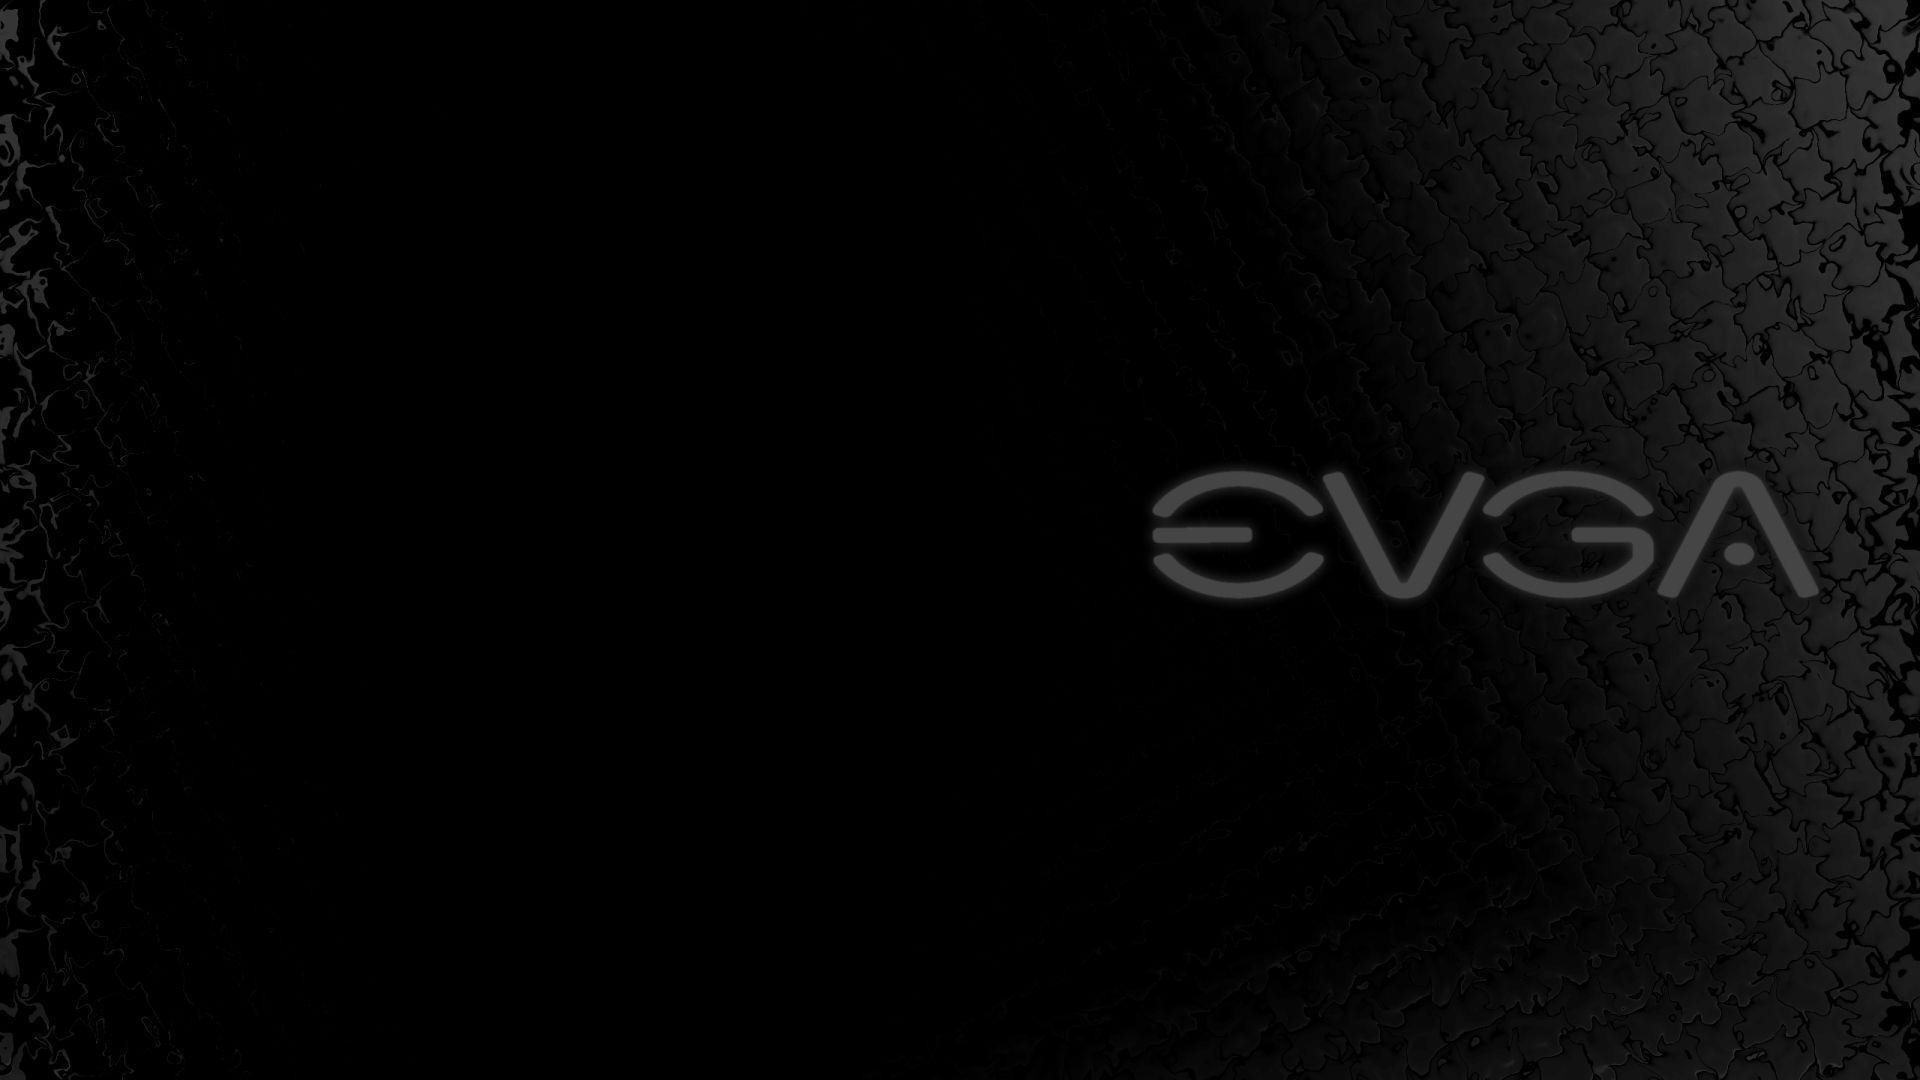 Images For > Evga Wallpaper 1920×1080